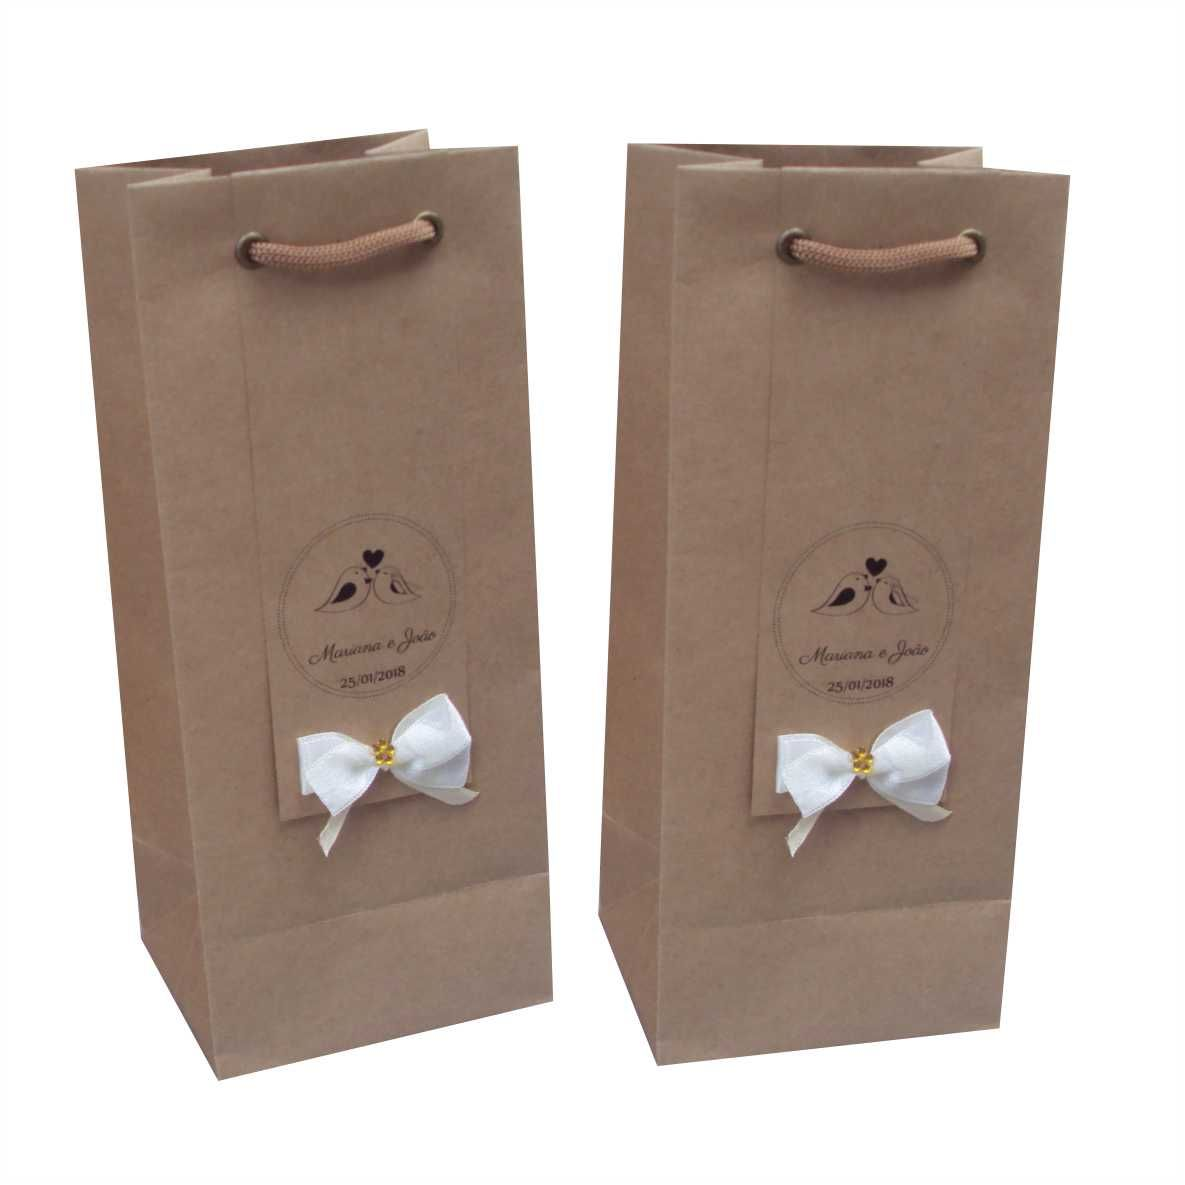 97f9e2a62 Sacola de papel kraft para mini garrafa - personalizada (11x23x9 cm) 15  unidades ...